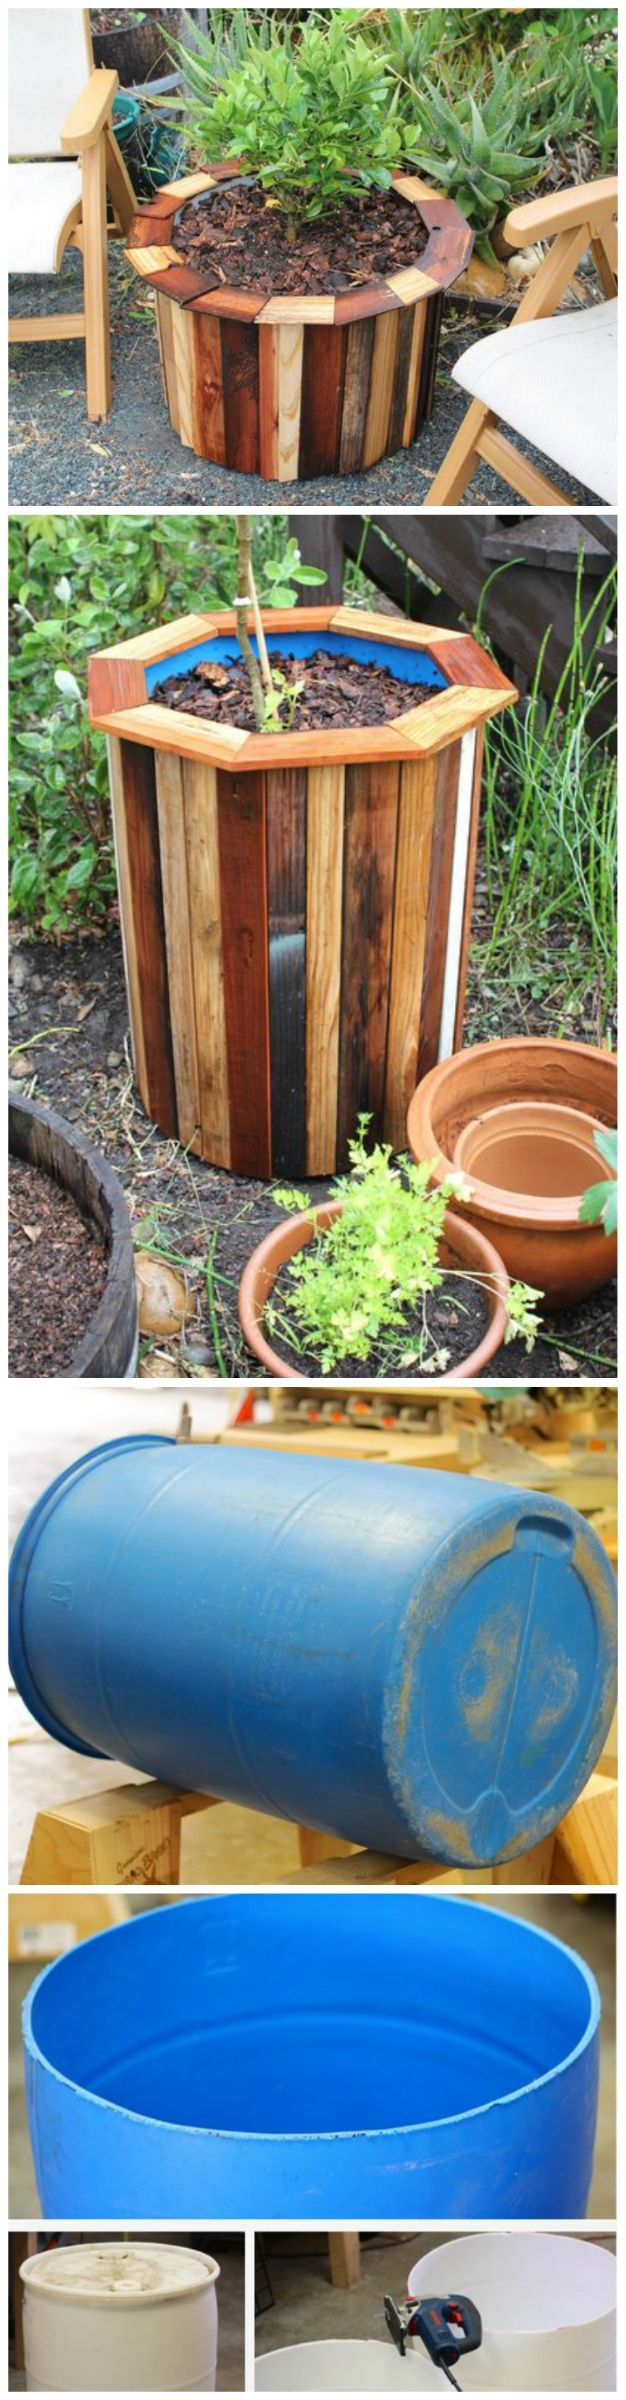 DIY Low Cost 55 Gallon Drum Planters